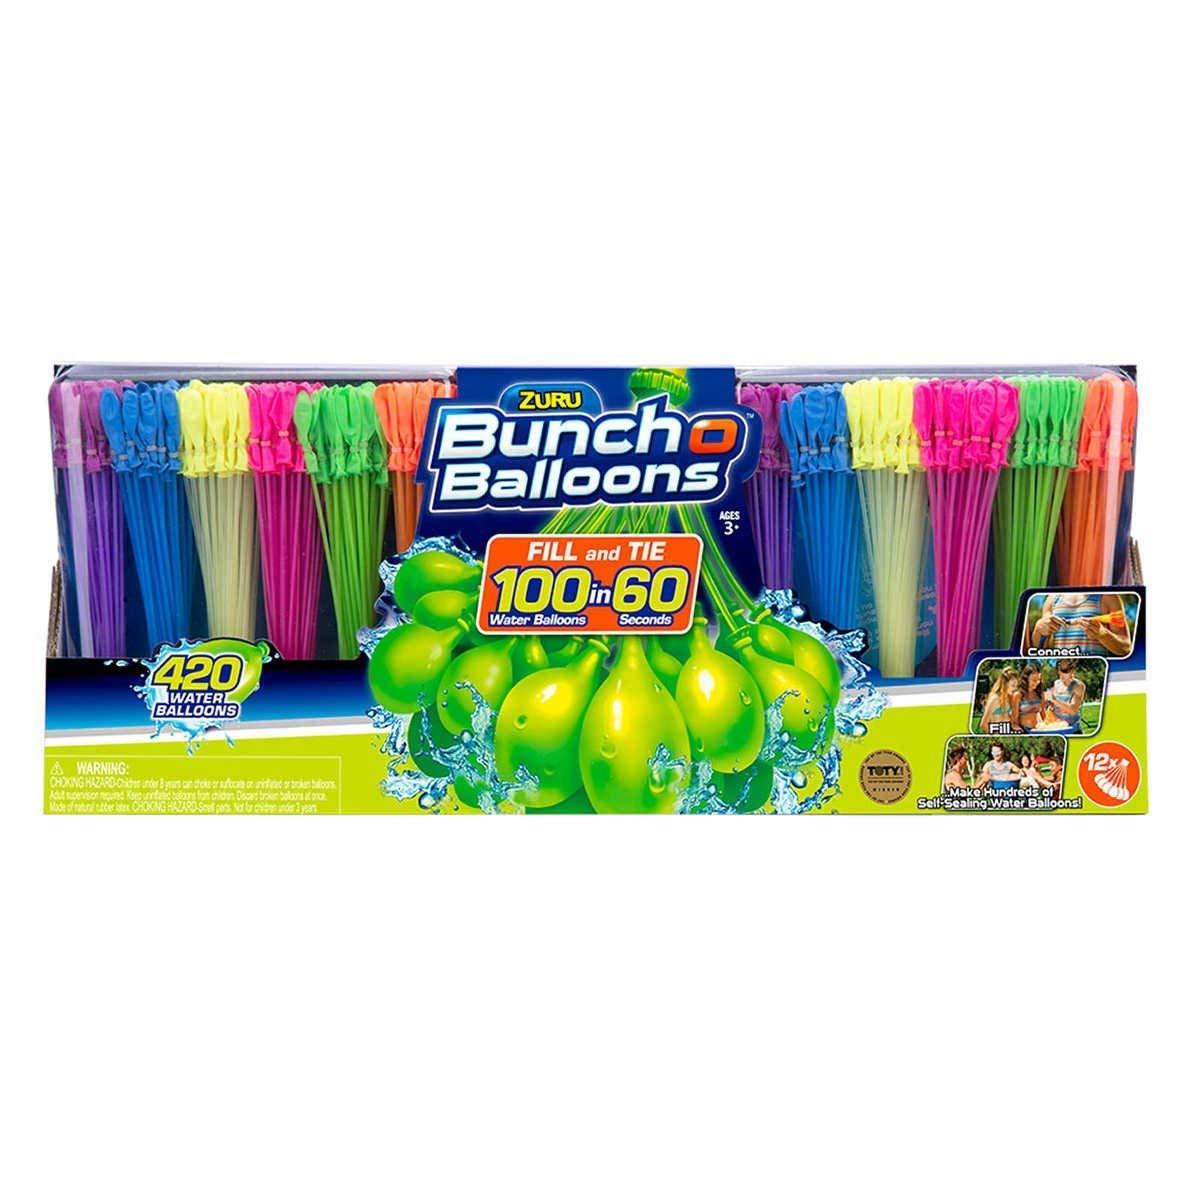 Bunch O Balloons Zuru Self-Sealing Water Balloons 420 Balloons, Pack of 3